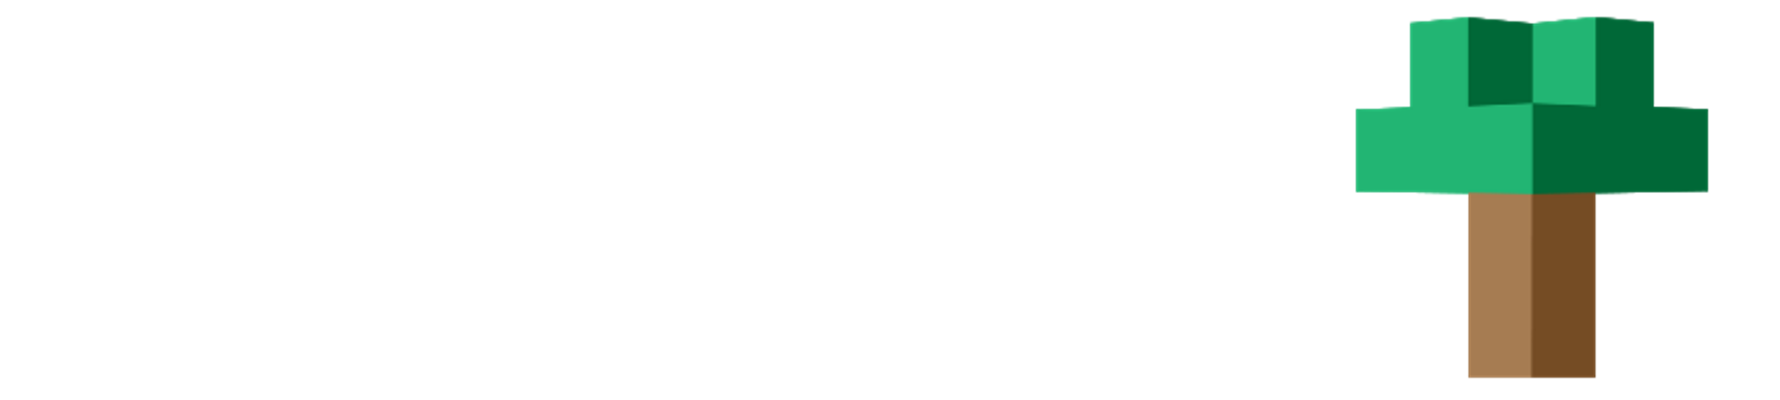 Nostalgia Shader Logo